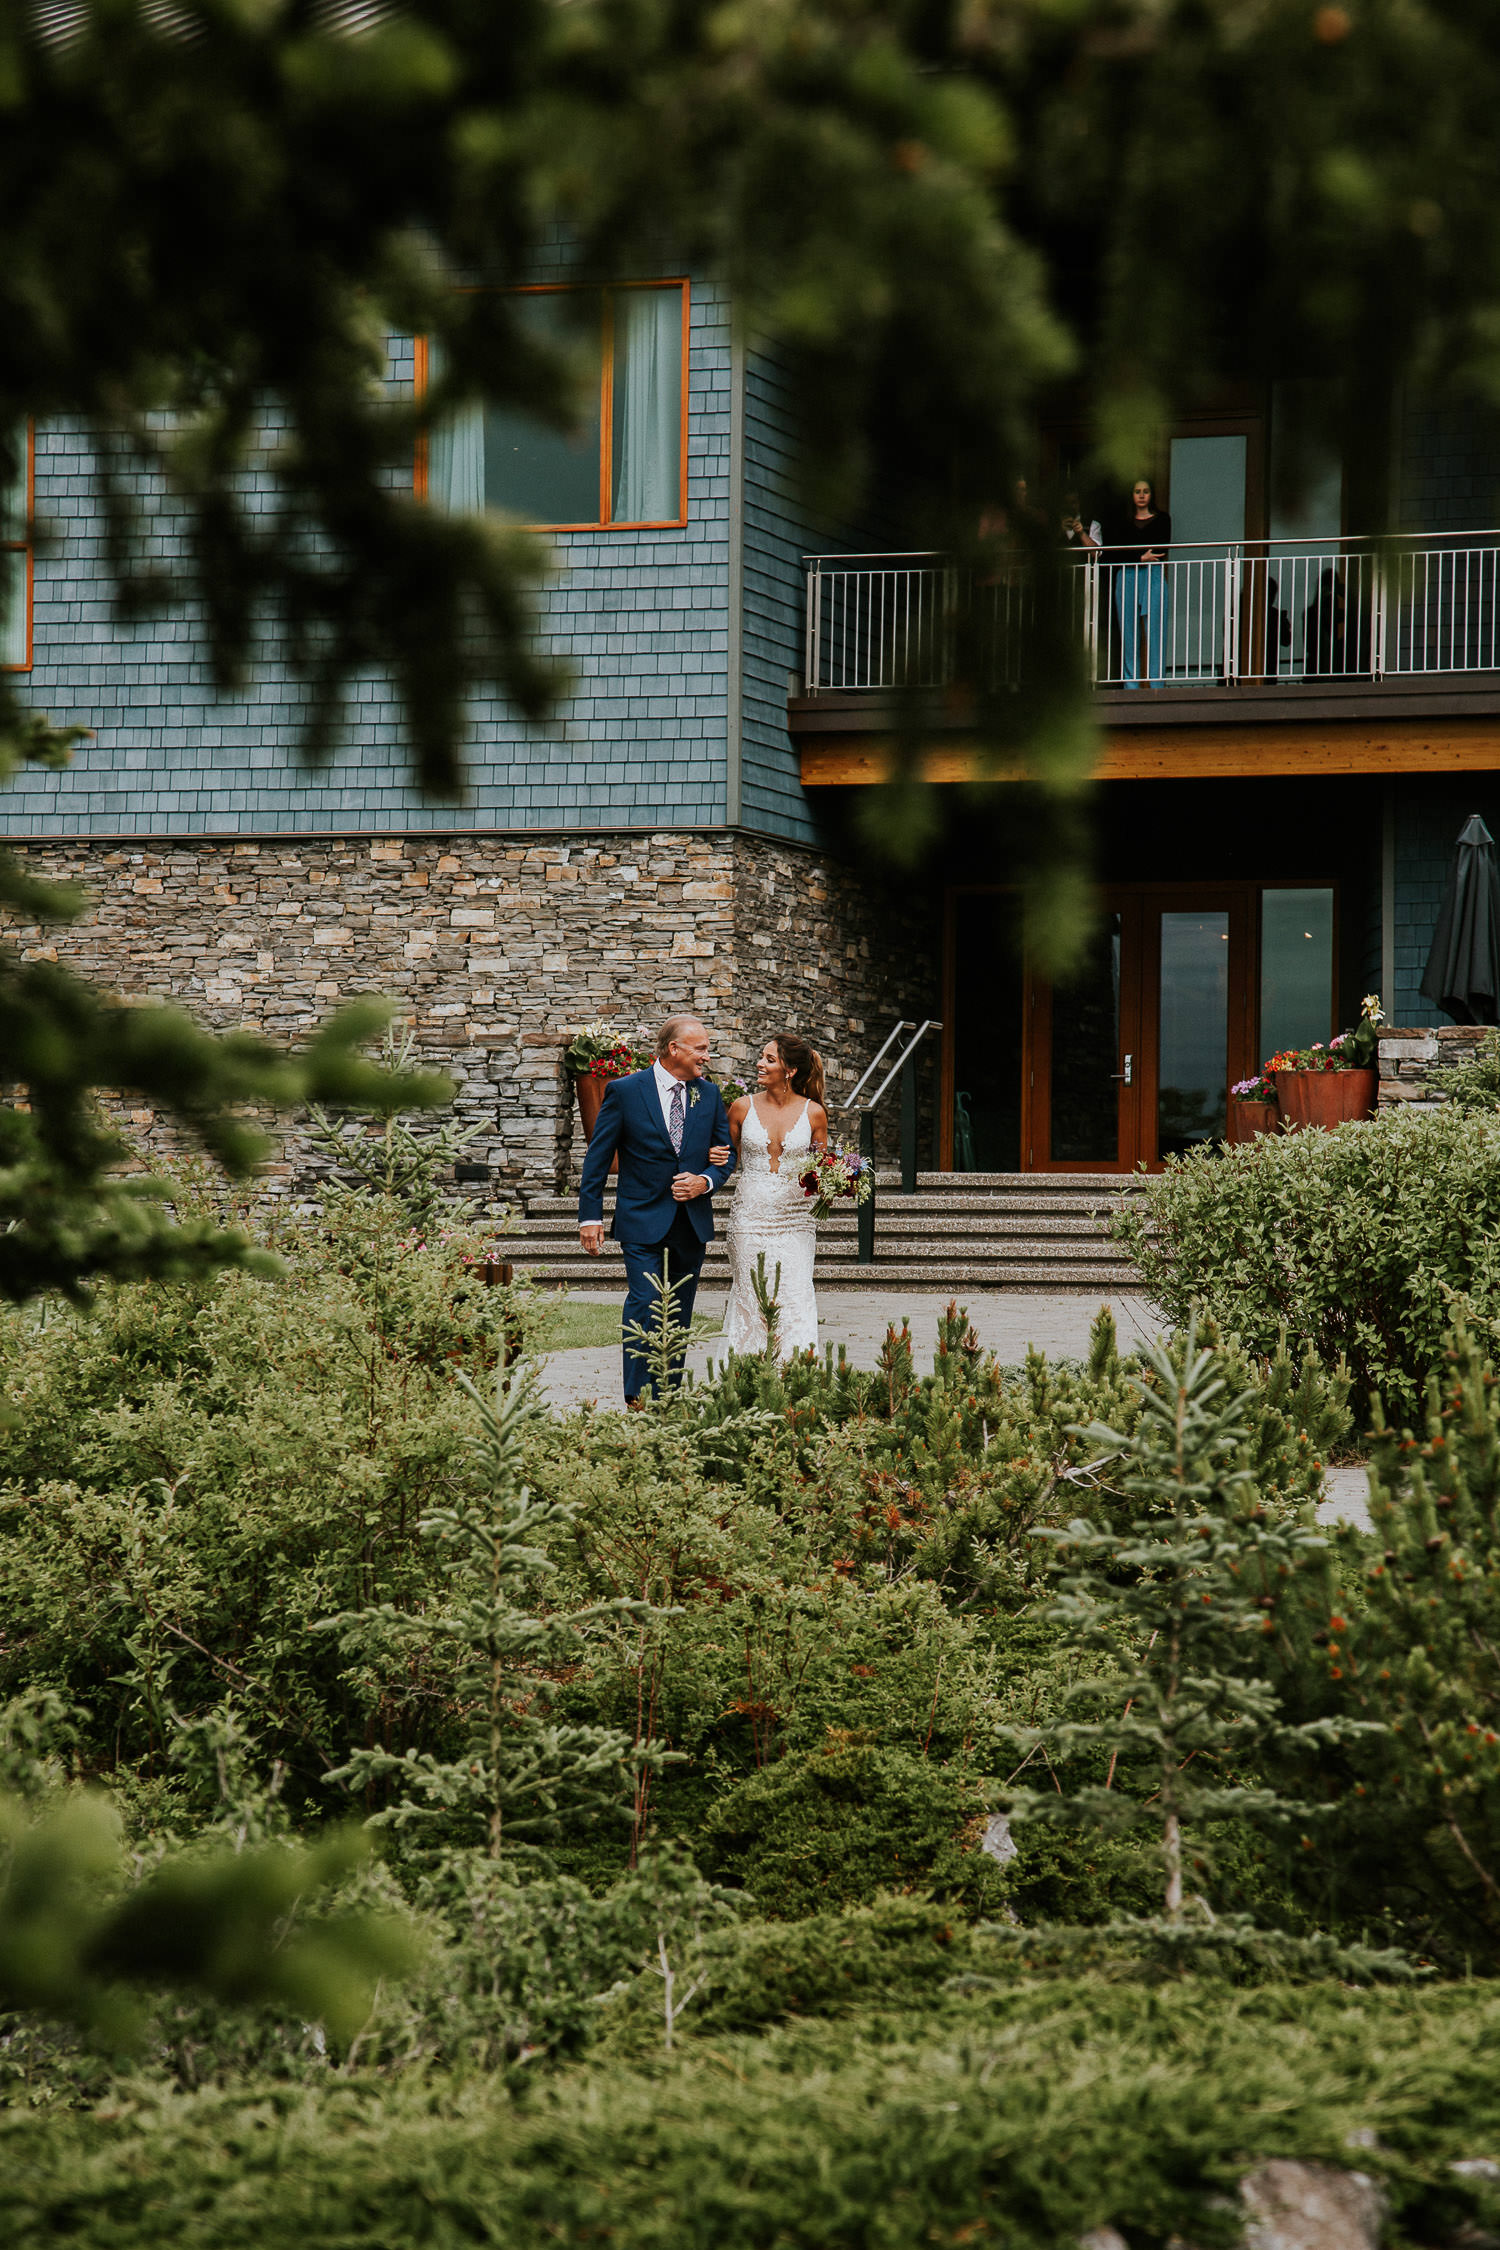 azuridge-estate-hotel-wedding-photographer-sarah-pukin-0131